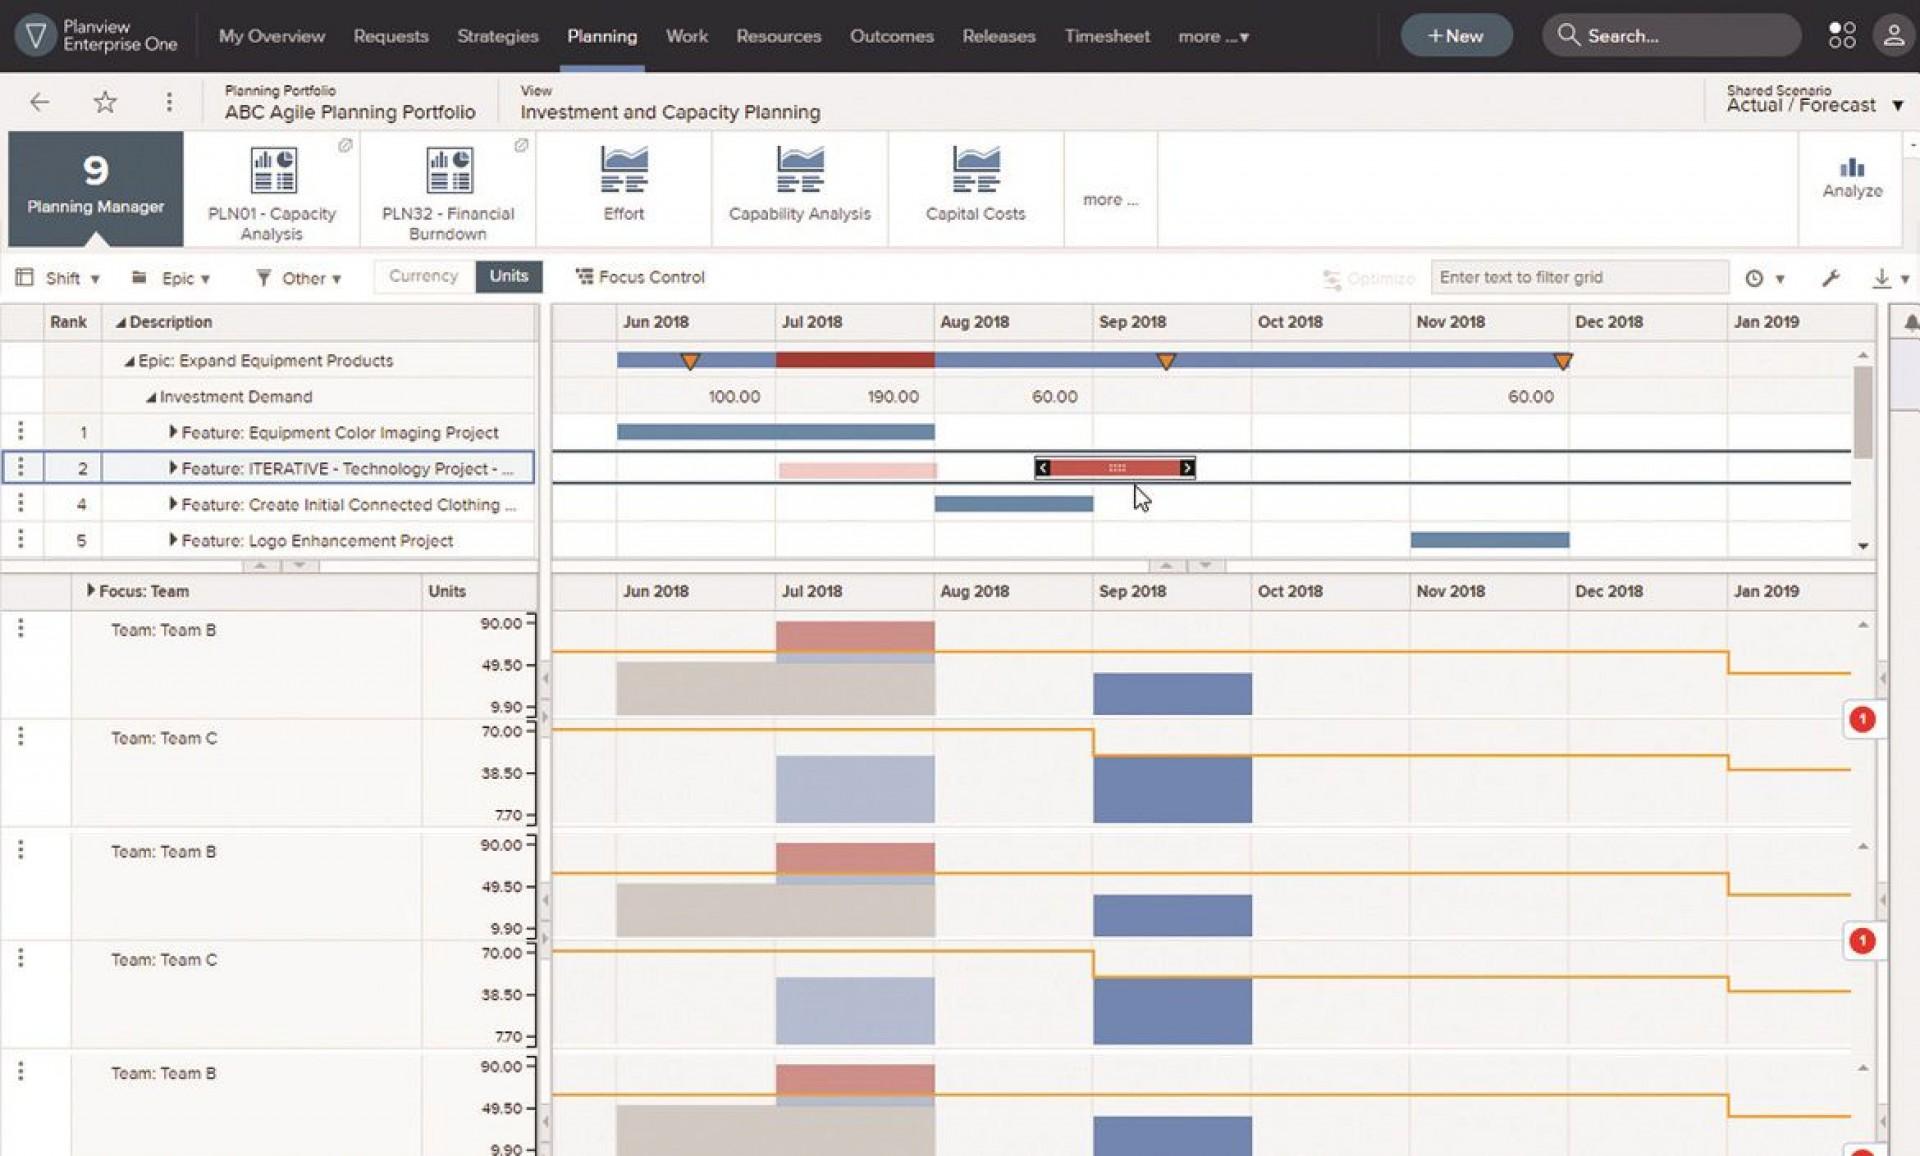 006 Impressive Agile Project Management Template Free Idea  Excel1920